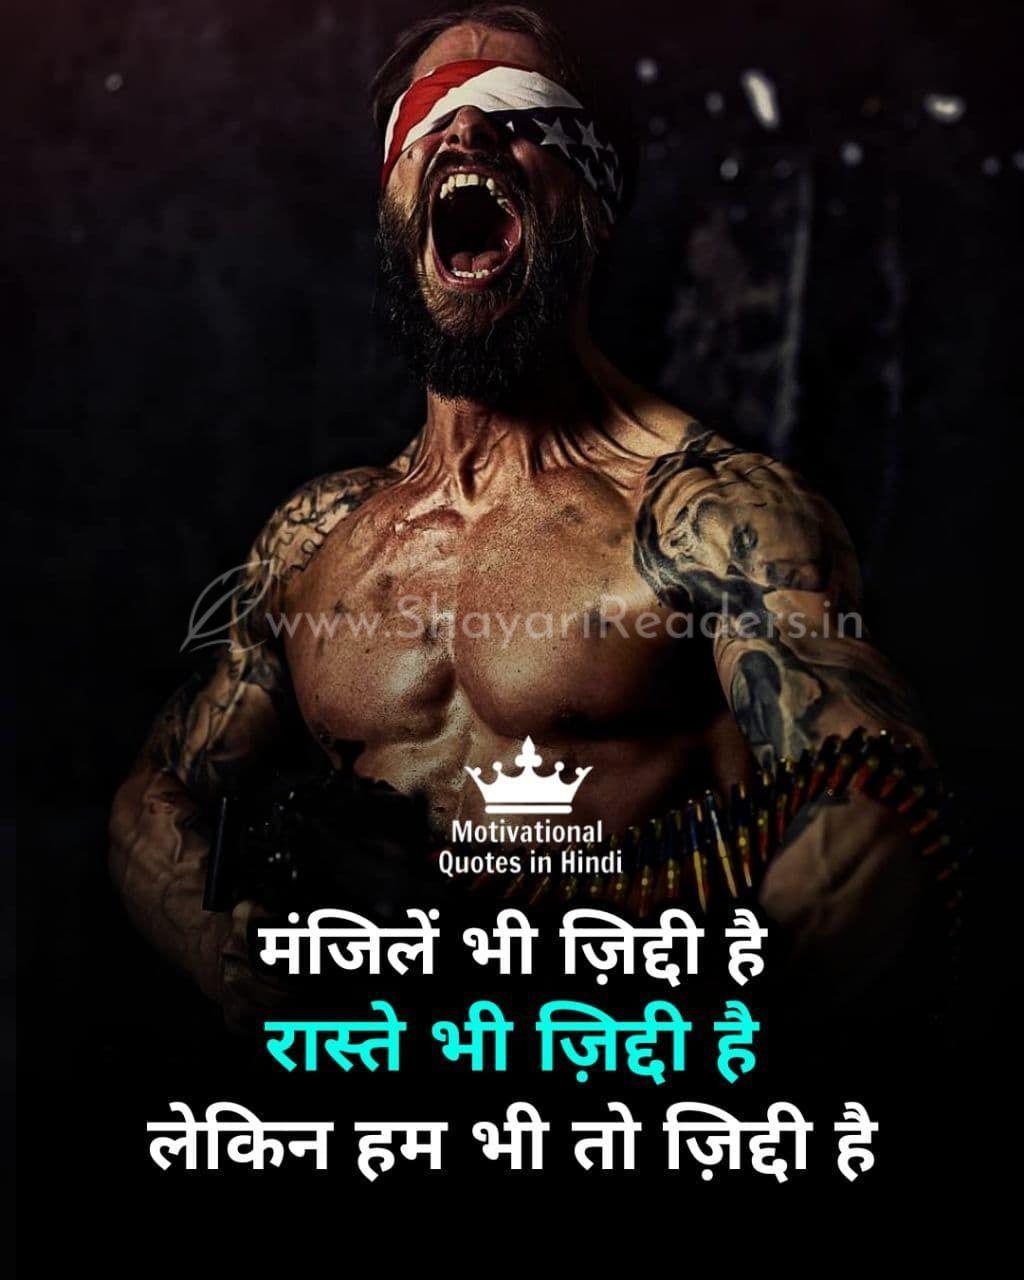 200+ Motivational Quotes in Hindi - मोटिवेशनल कोट्स हिंदी मैं